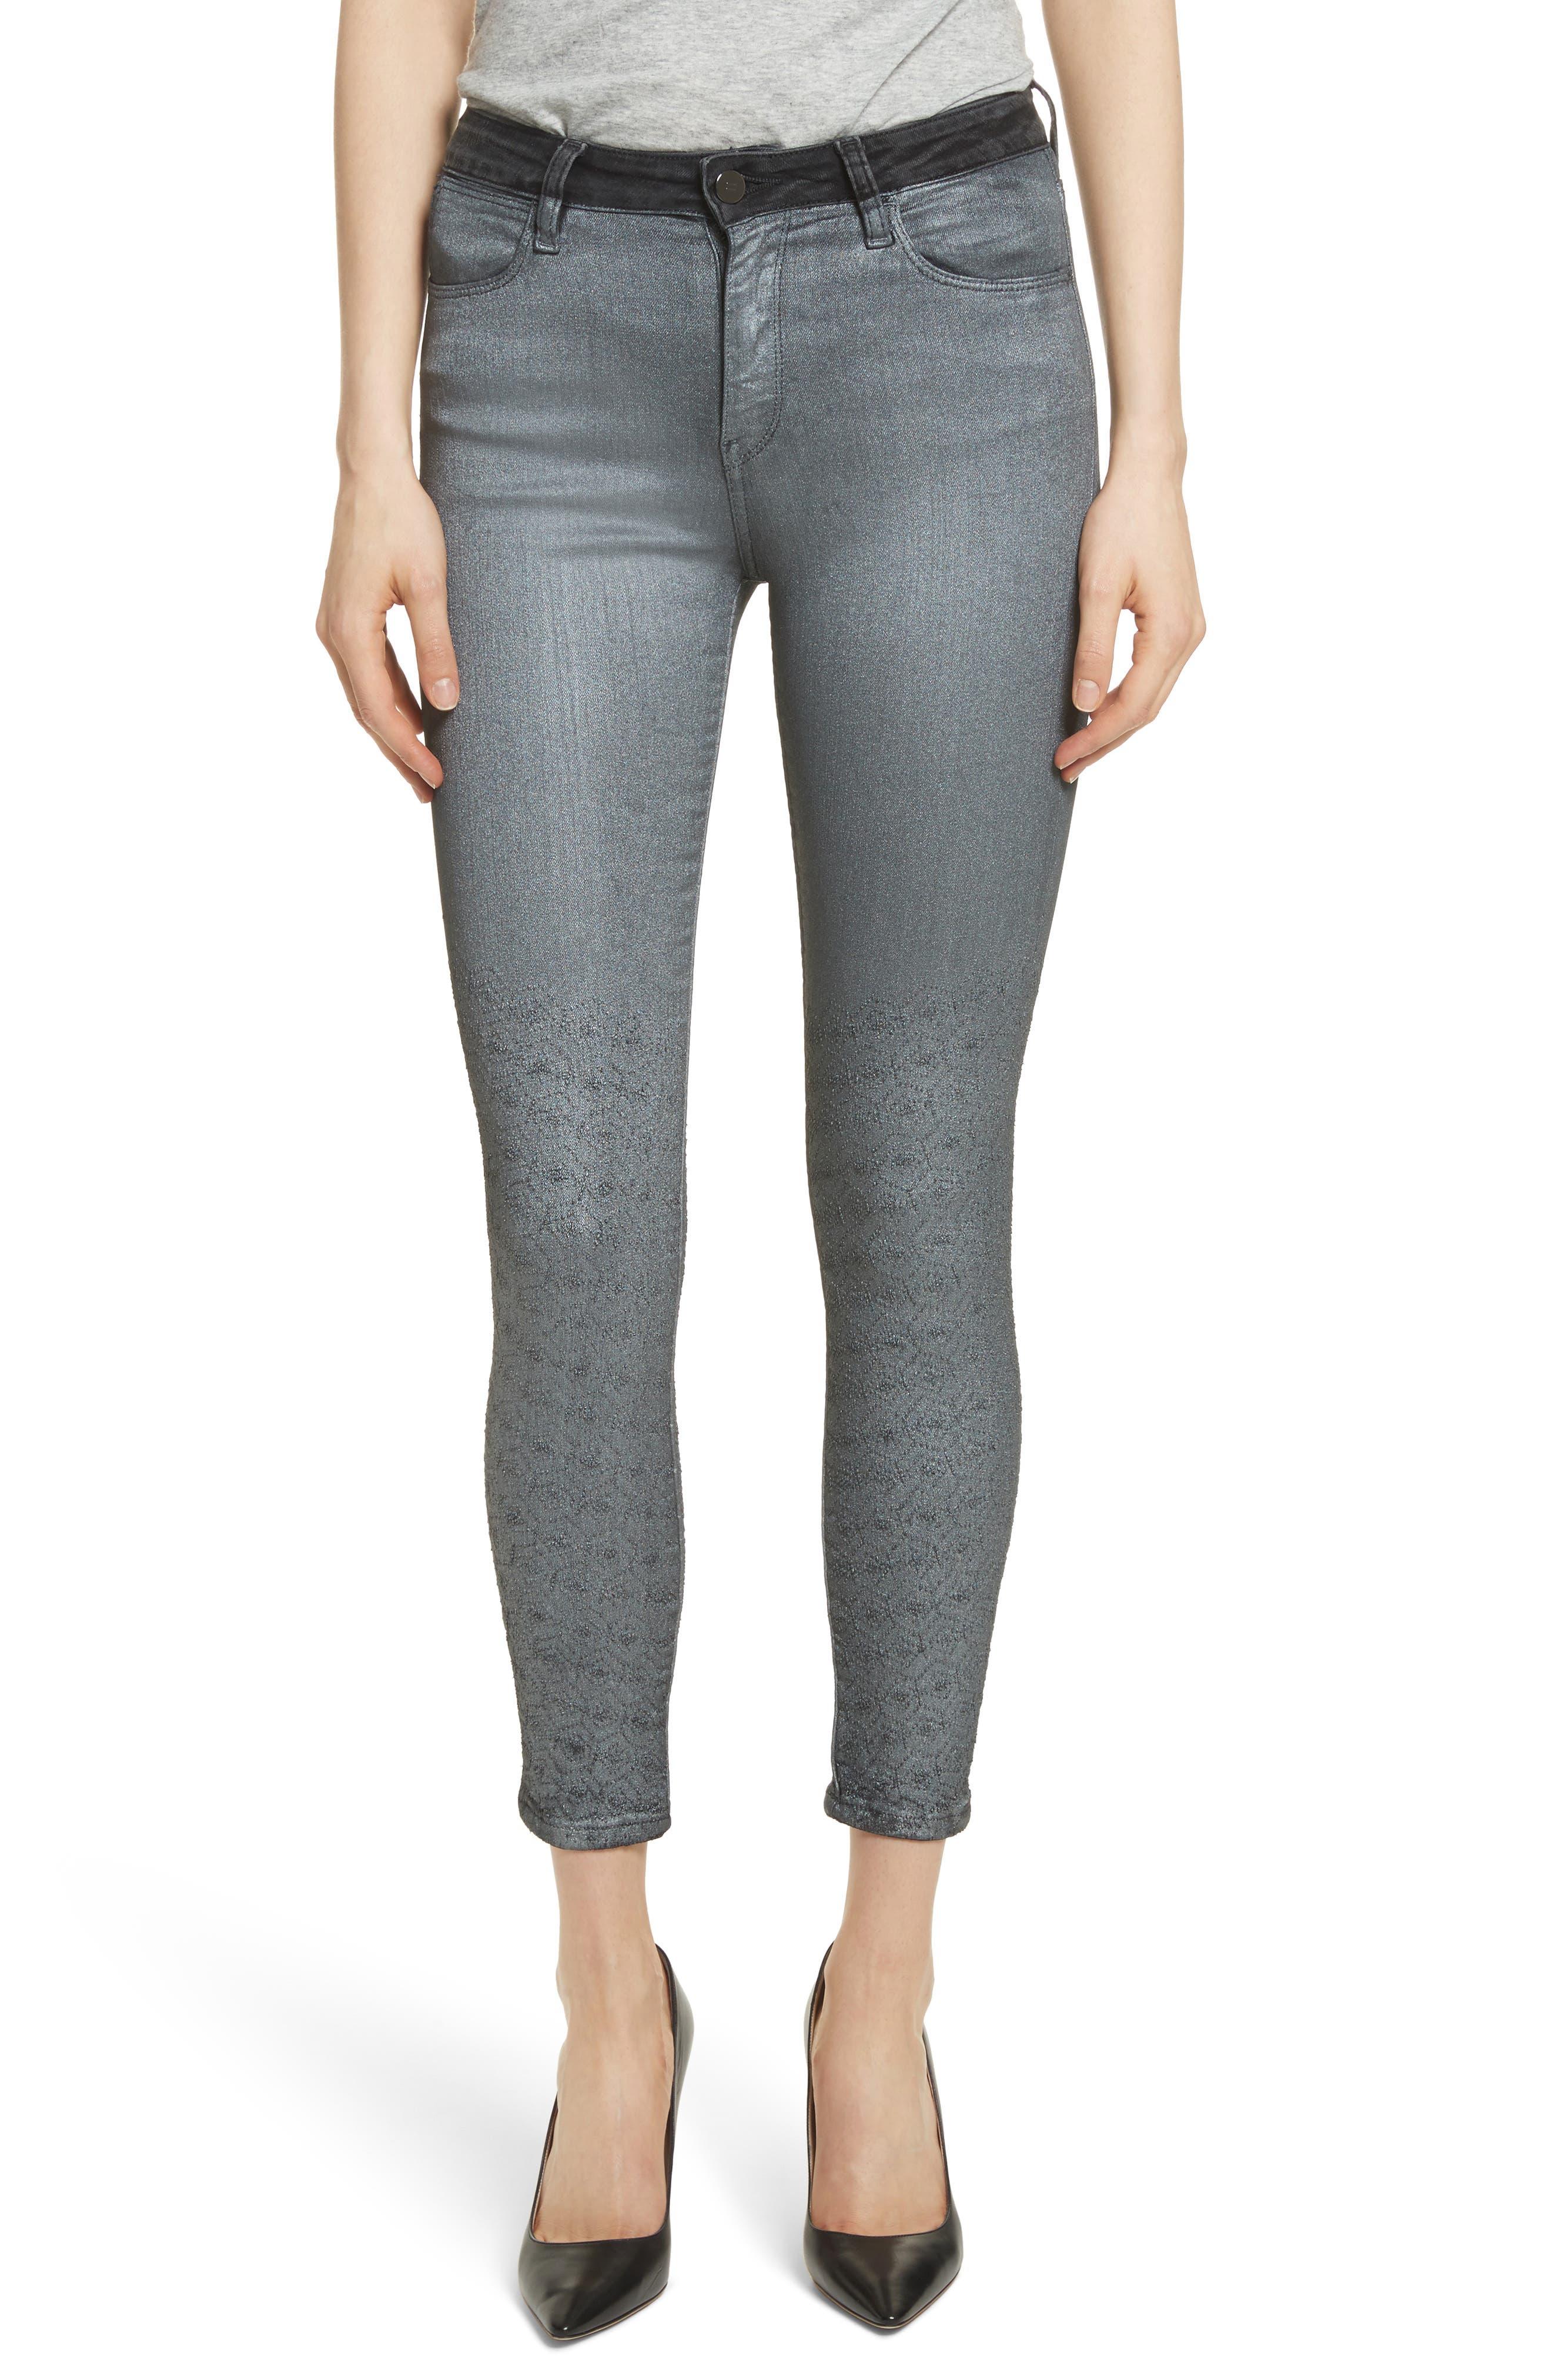 Reina Glitter Skinny Jeans,                             Main thumbnail 1, color,                             Black Used Glitter Silver